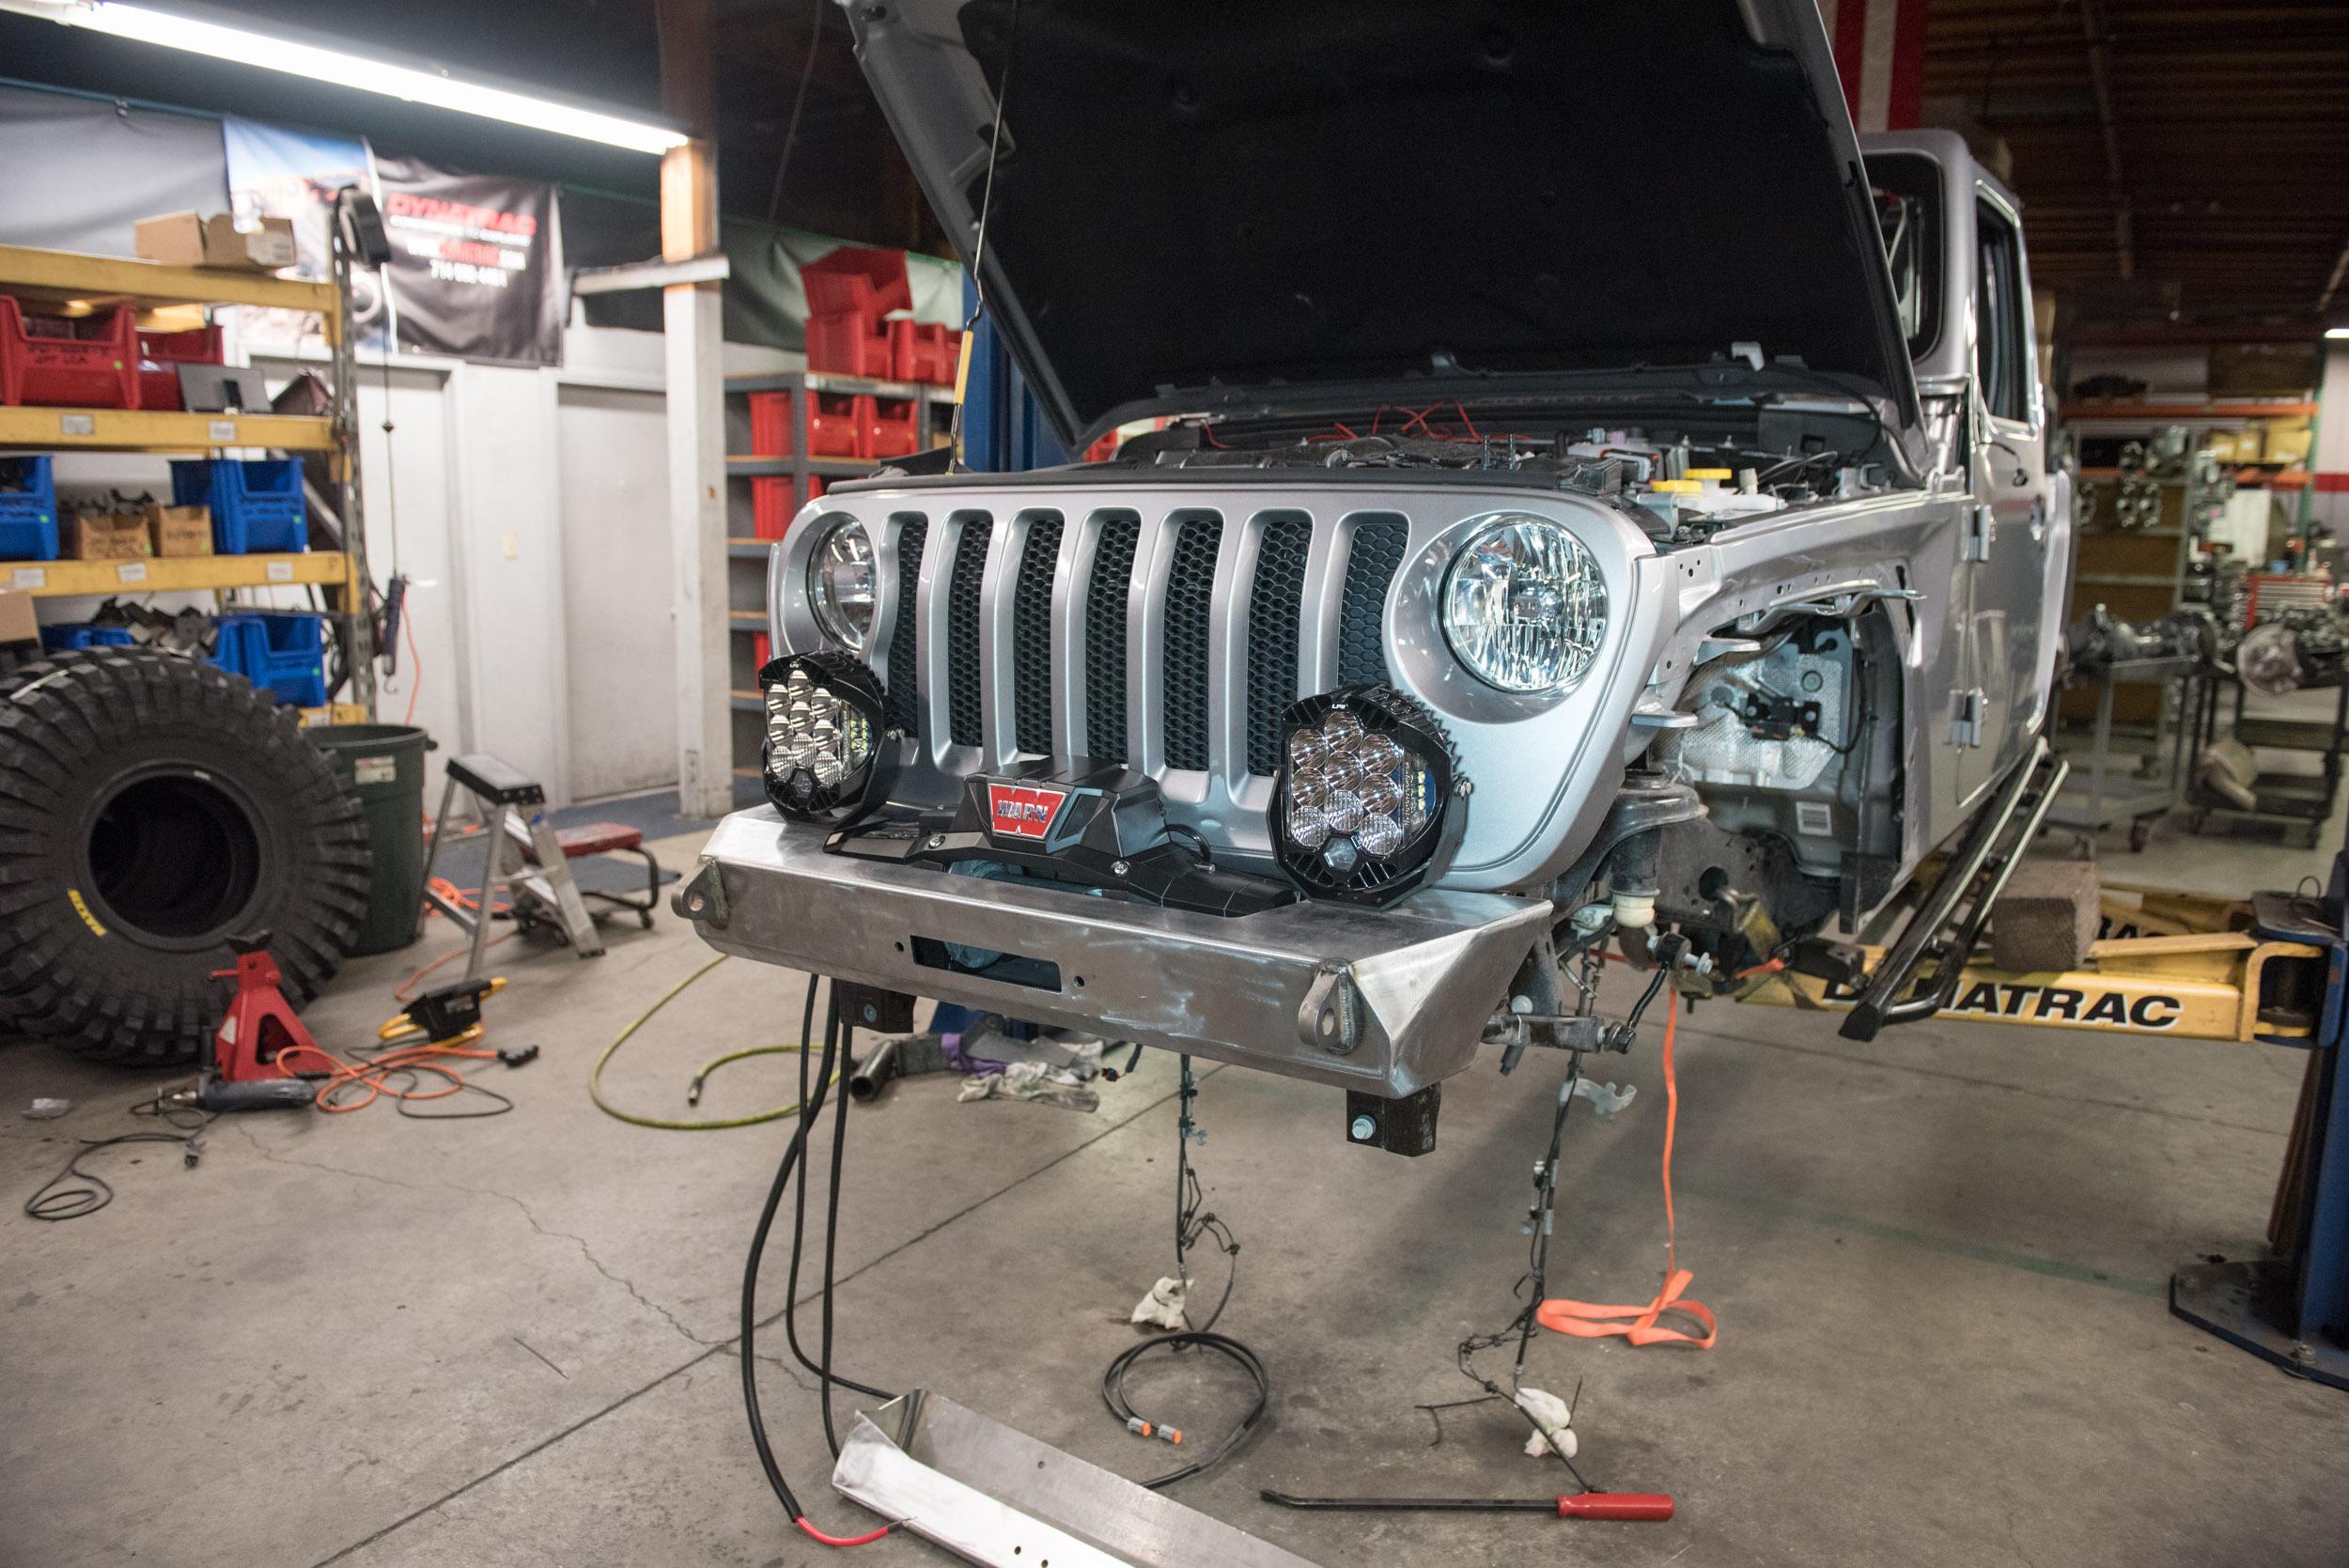 Dynatrac CODE1 2018 Jeep Wrangler JL Build Dynatrac Tech Info and News